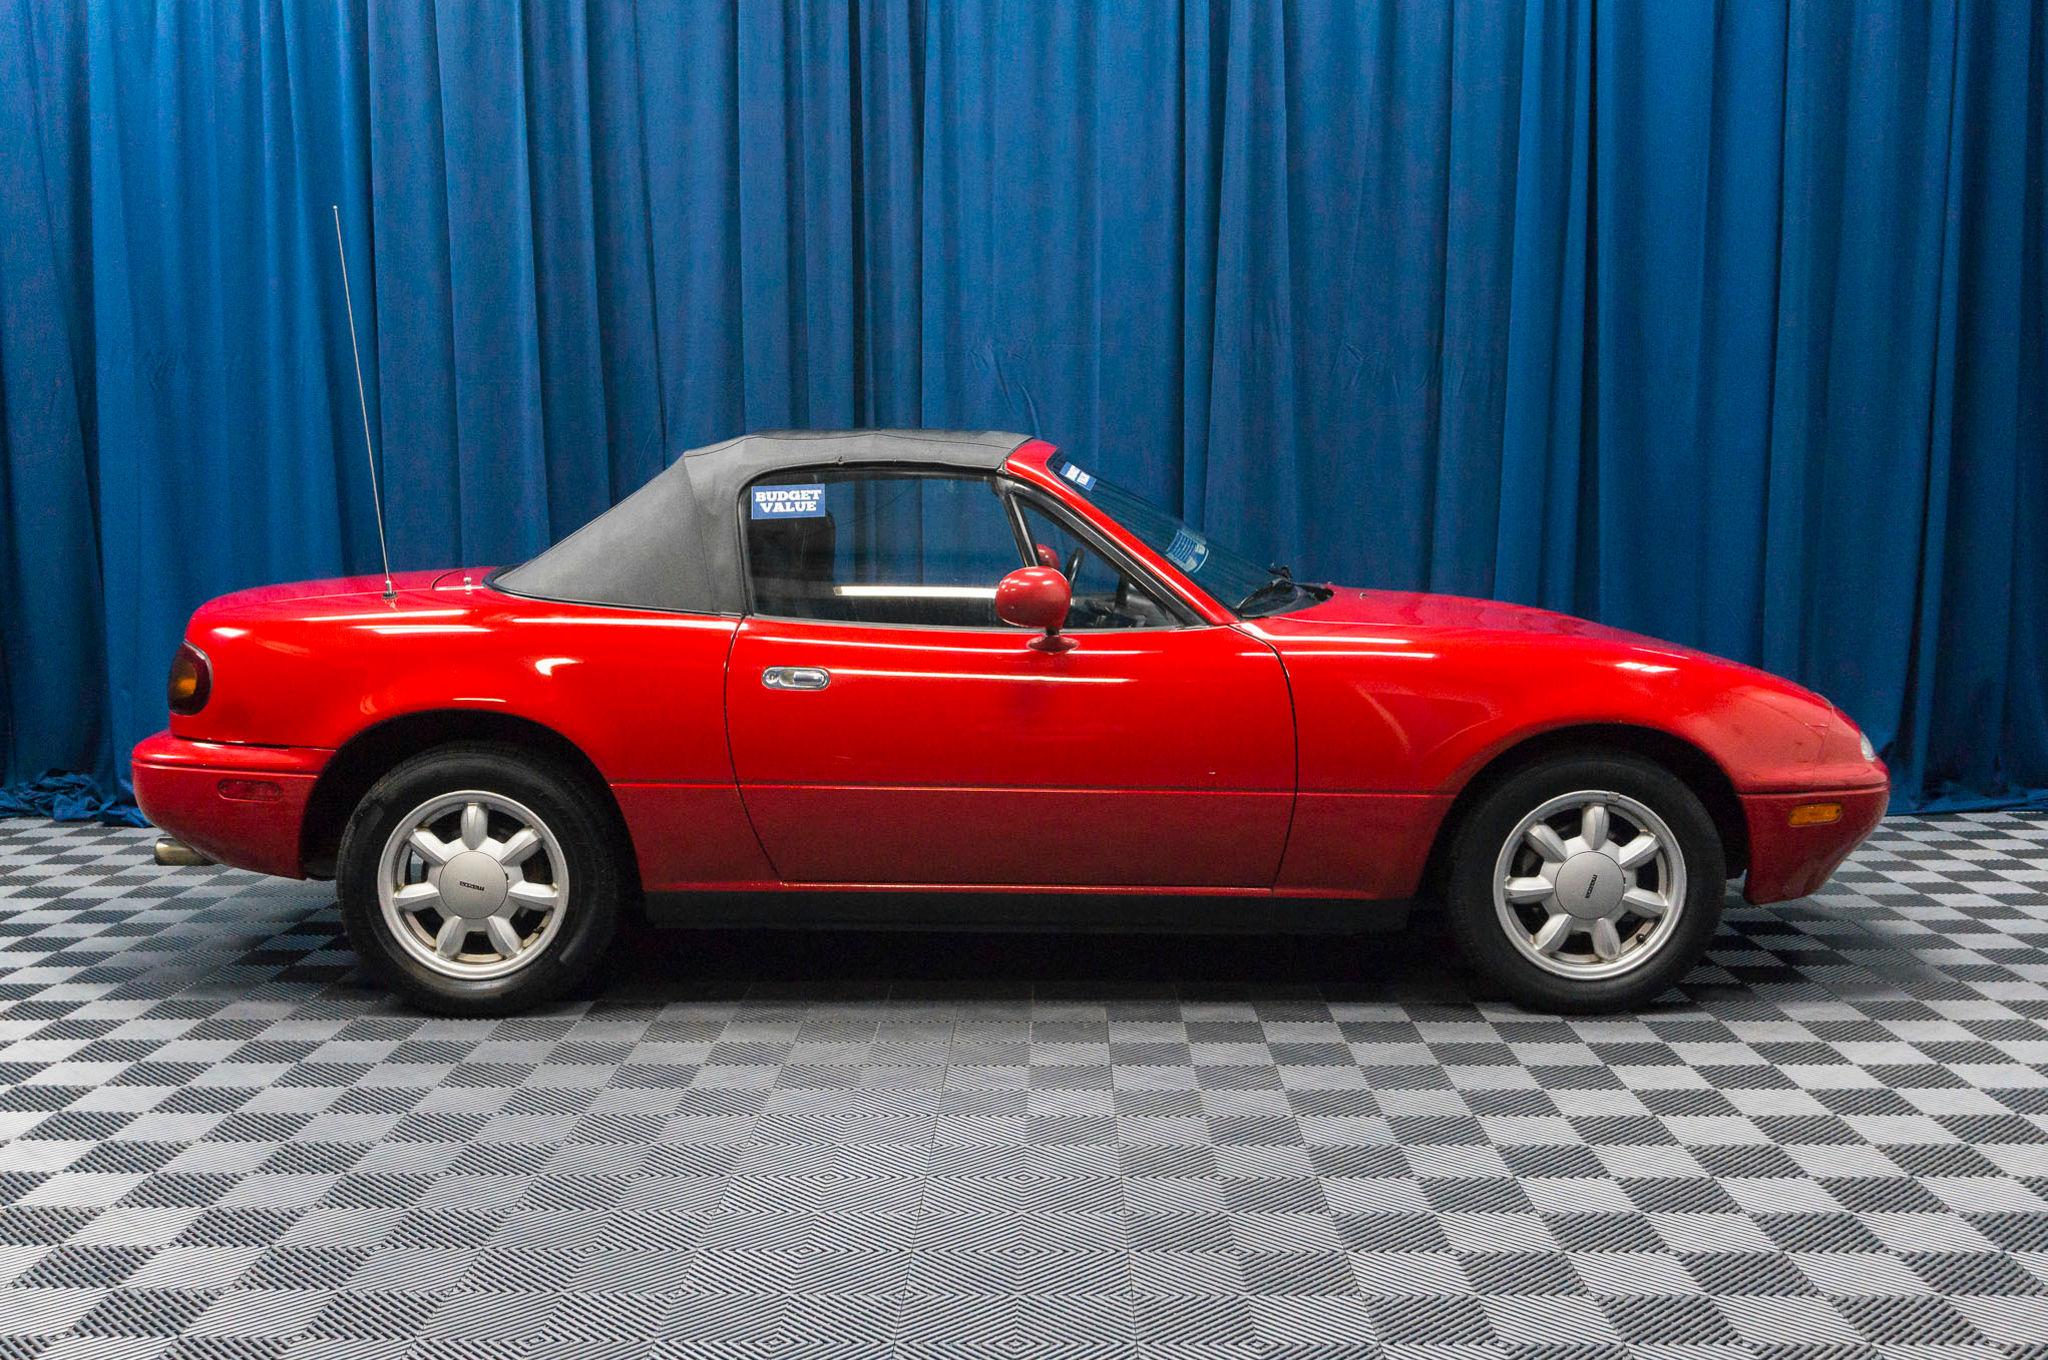 Used 1991 Mazda Miata RWD Convertible For Sale - 46565B